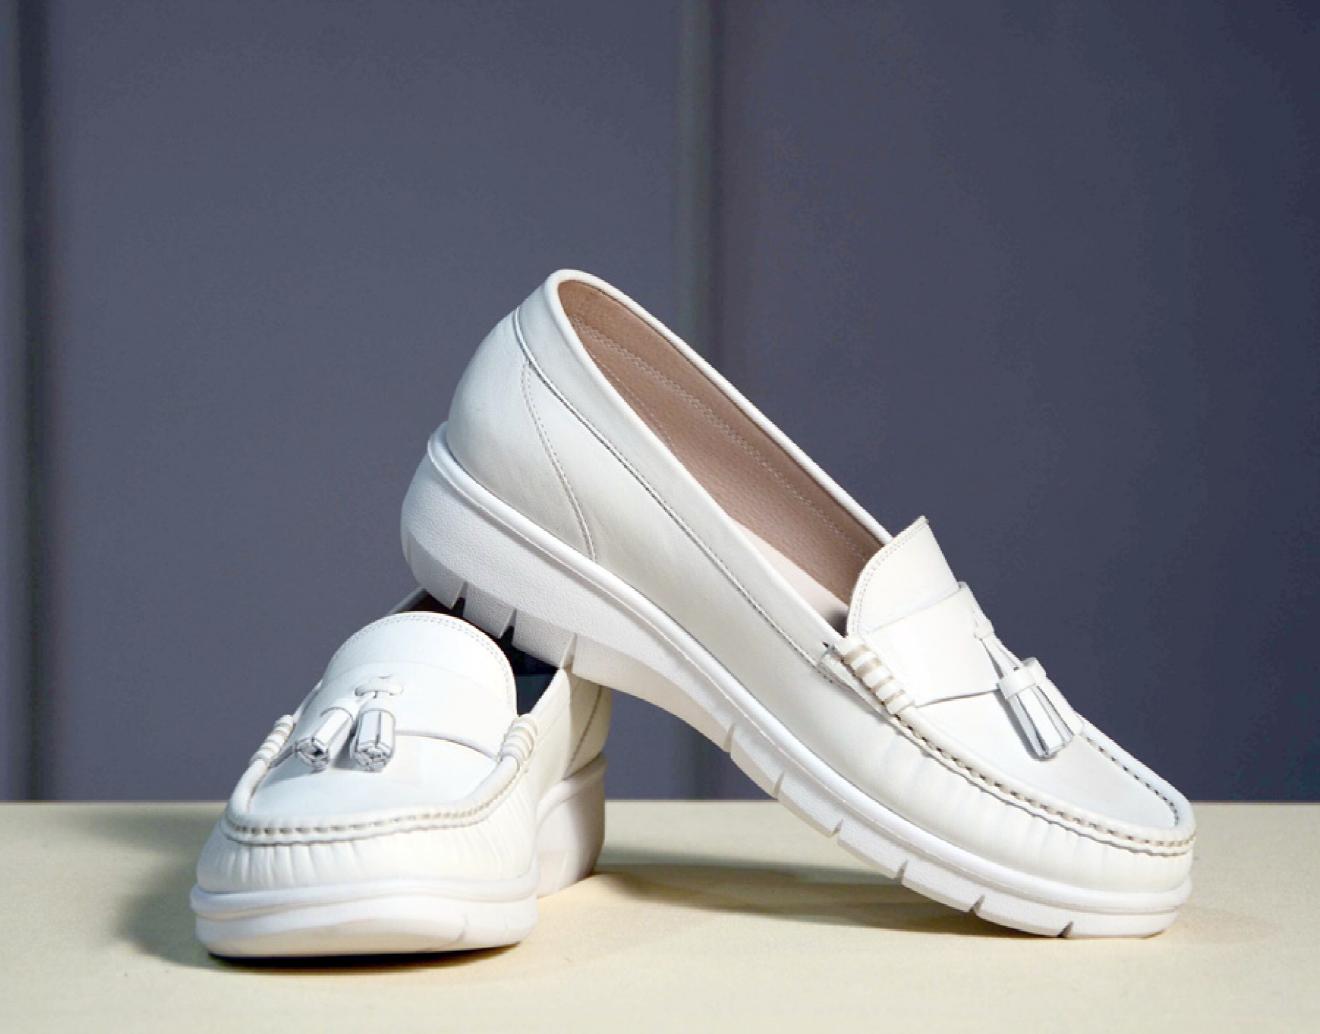 C03040 รองเท้าหนัง CUMI